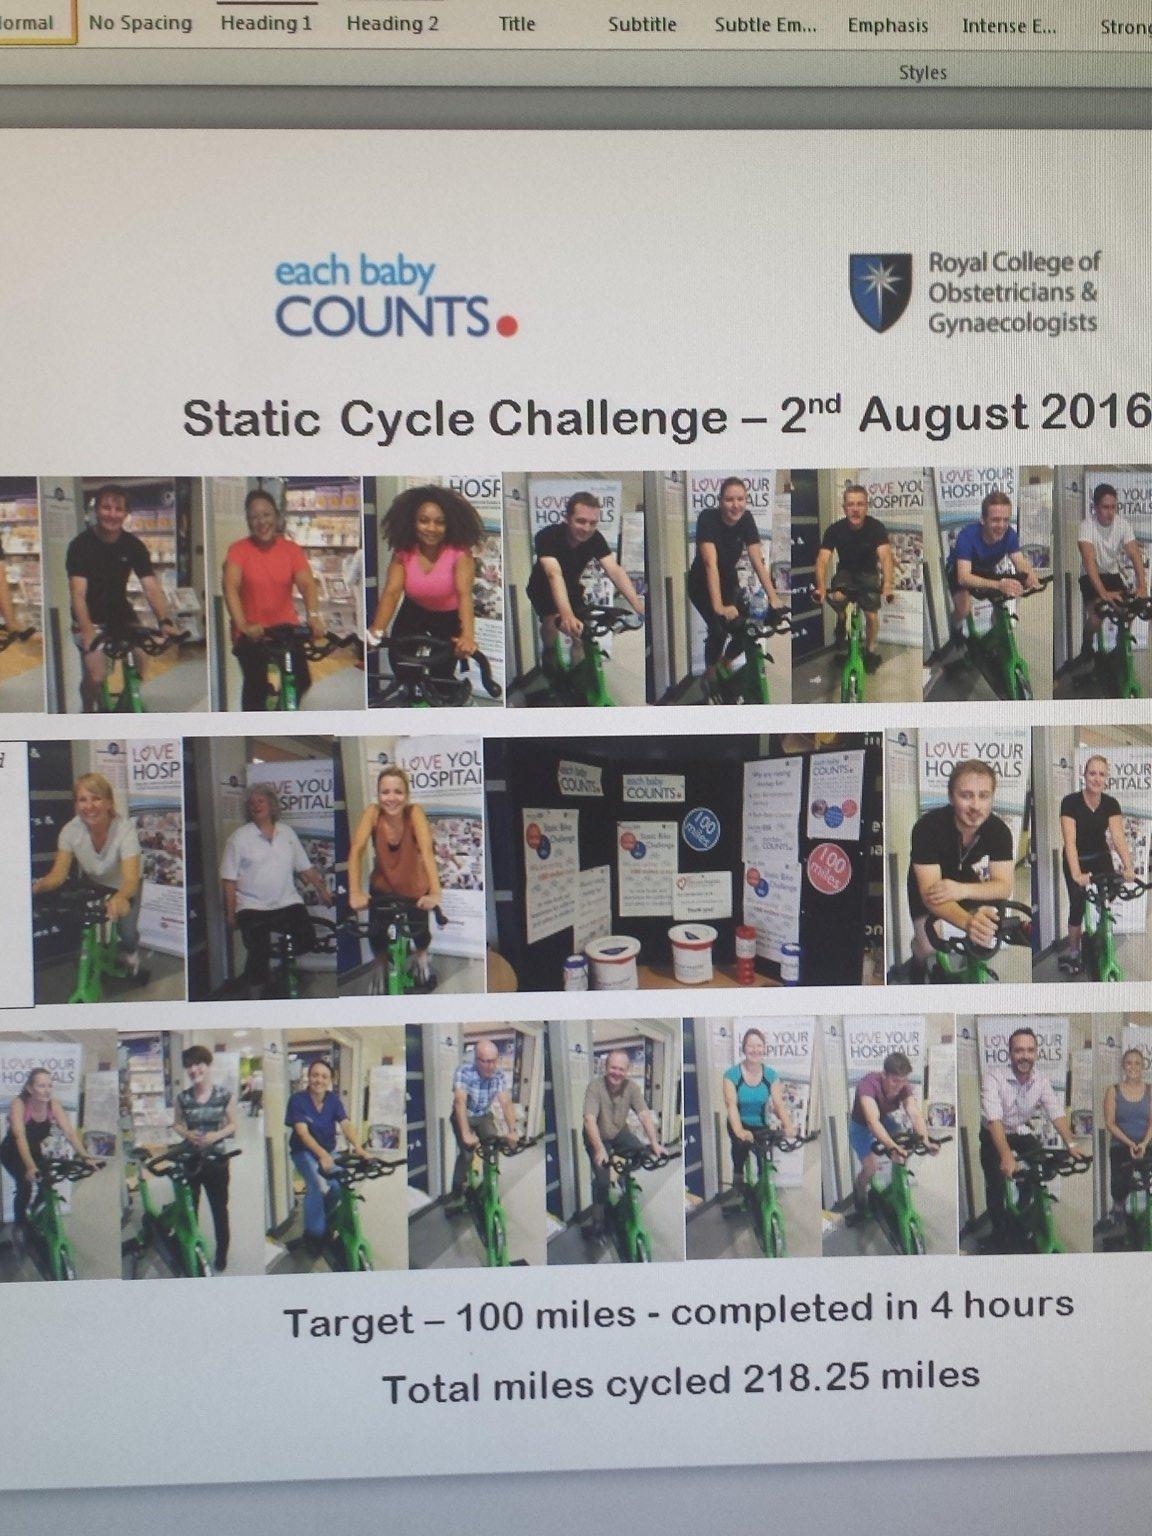 Excellent team effort- 100 miles target- 218.25 miles cycled #eachbabycounts #financeactive https://t.co/I49JPipOCn